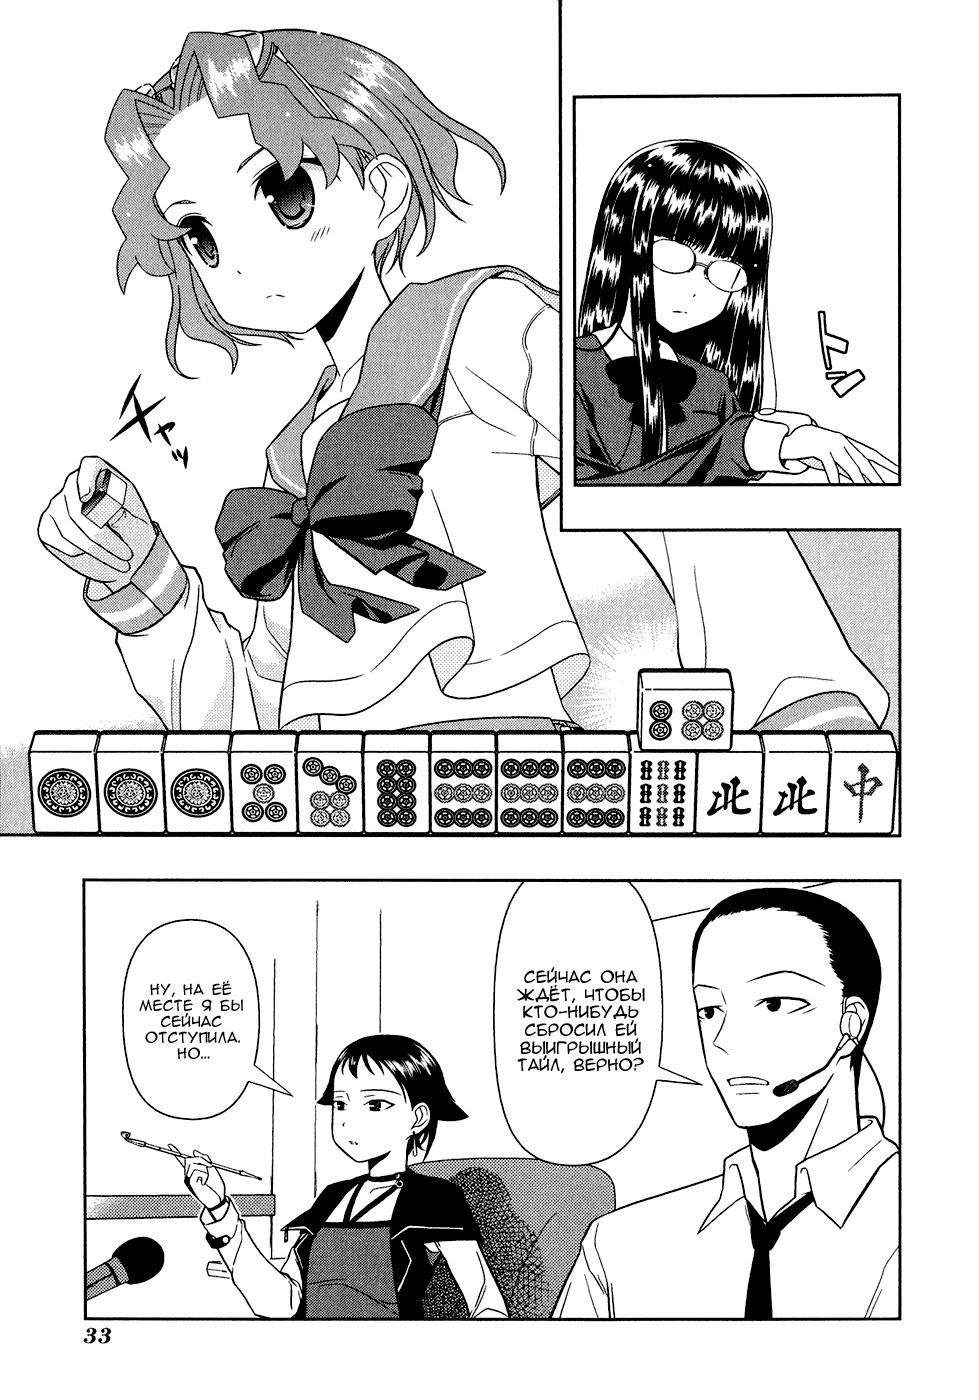 https://r1.ninemanga.com/comics/pic2/33/21665/216001/1428337158735.jpg Page 6